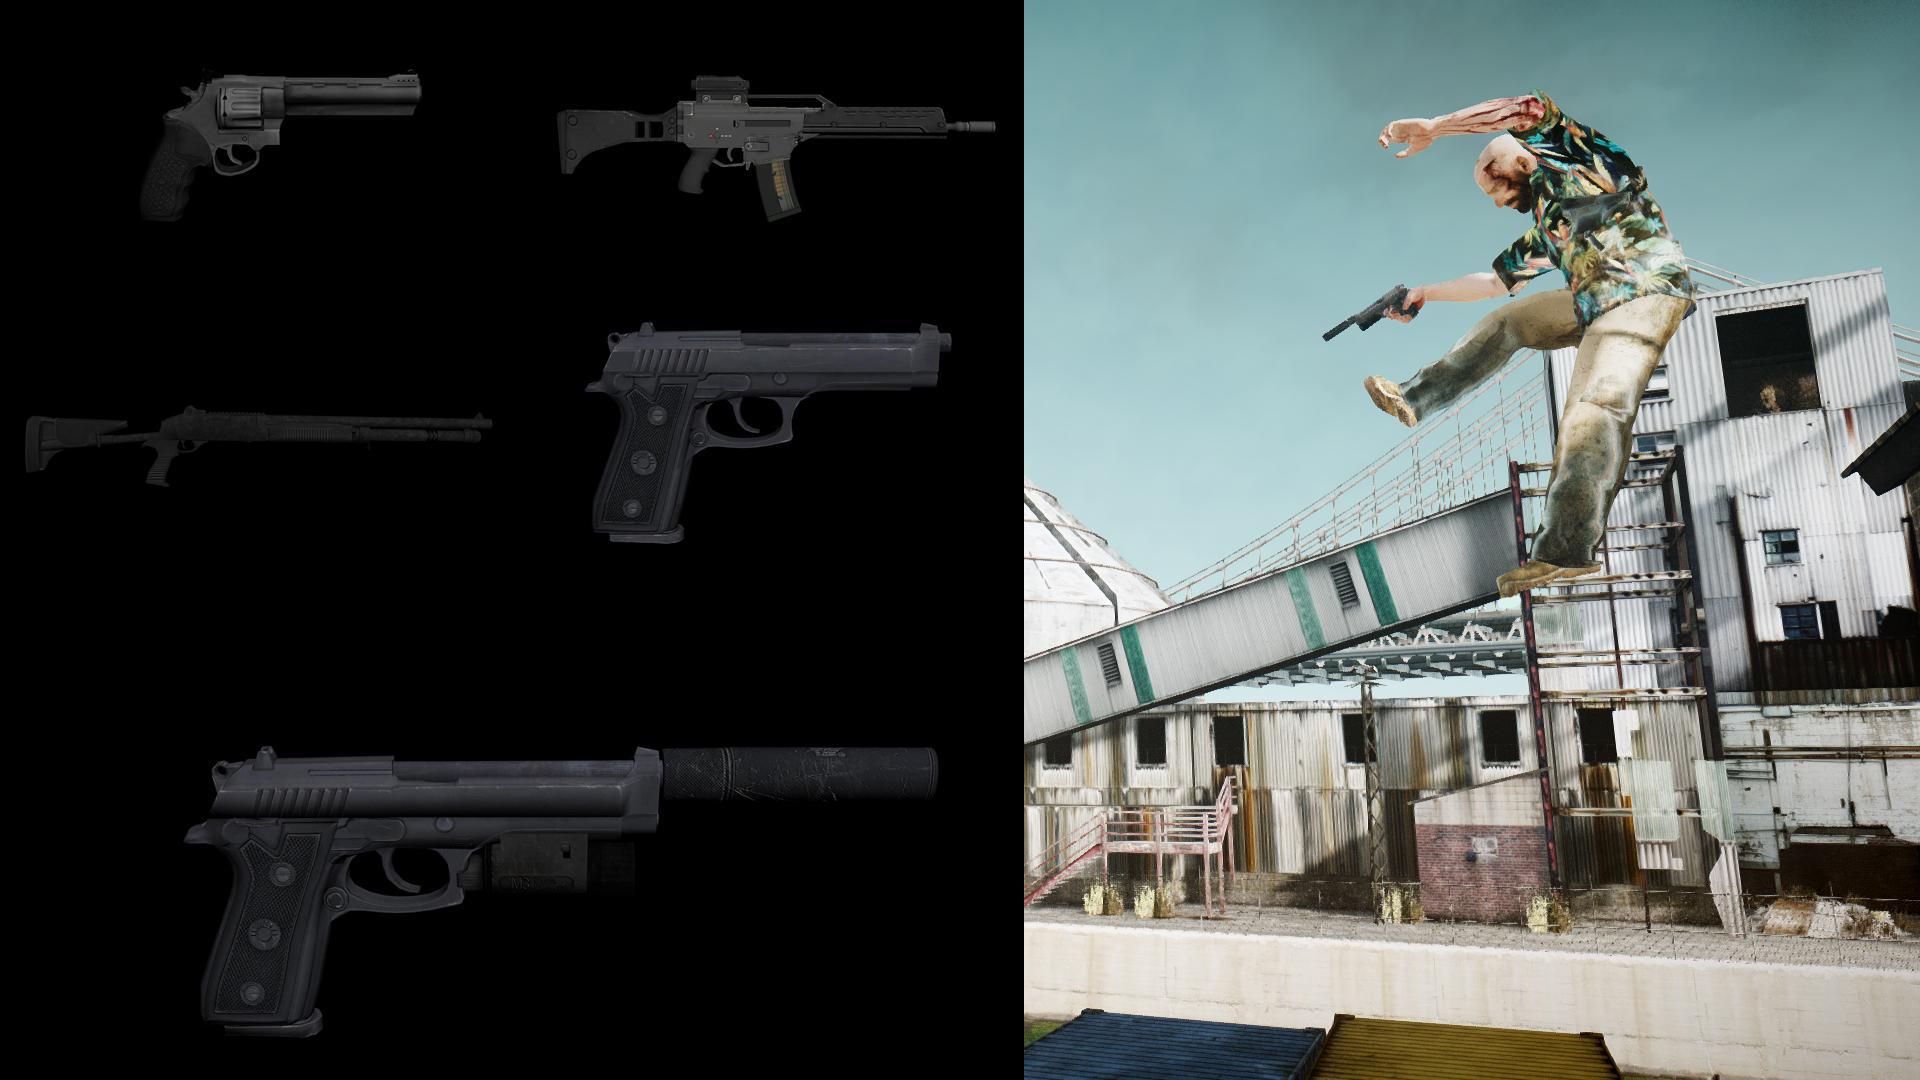 Max Payne 3 Русификатор Звука